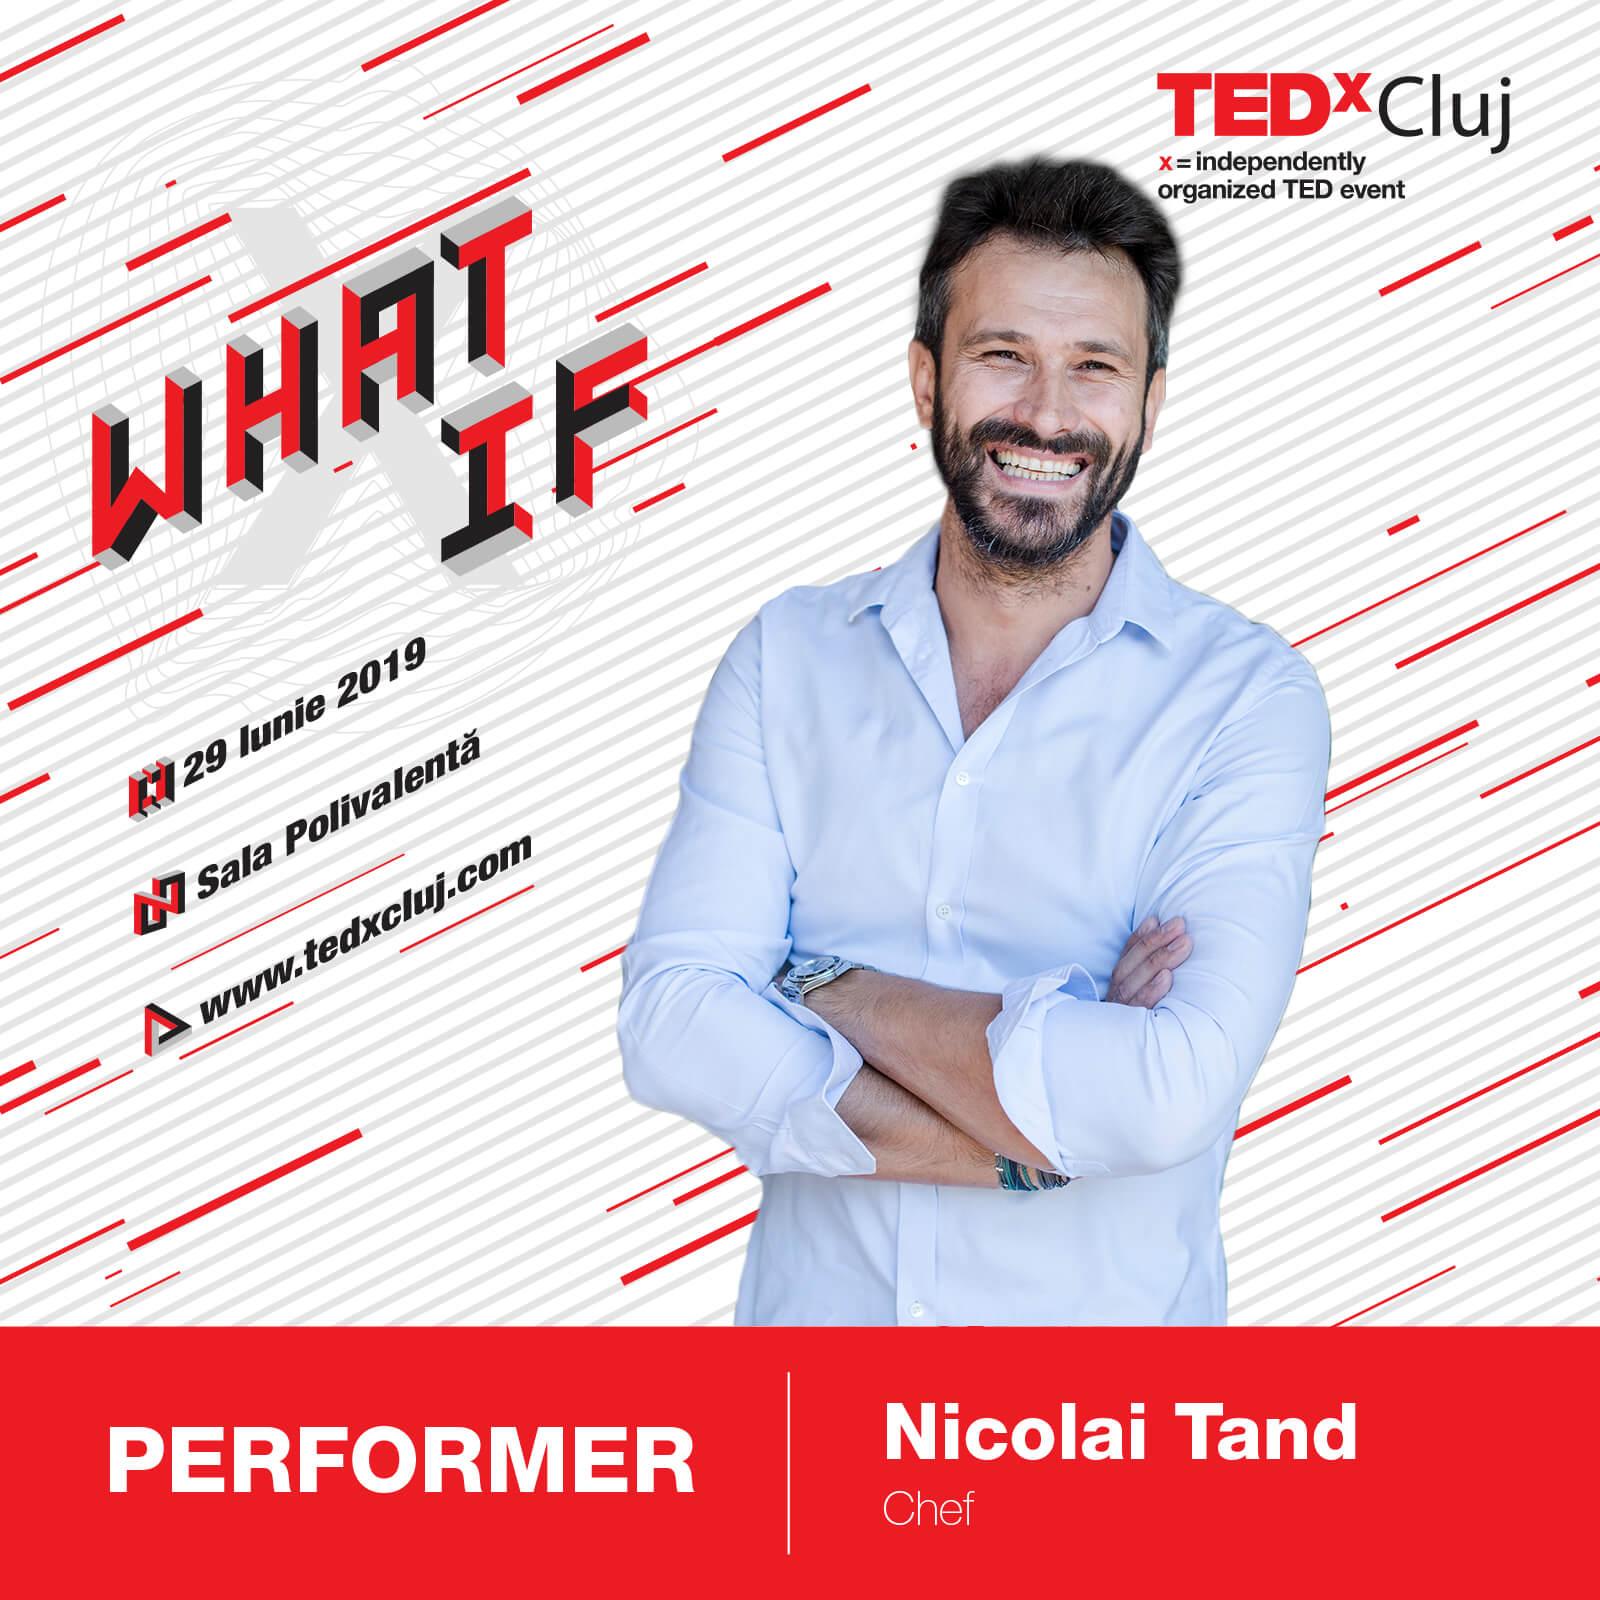 Nicolai Tand TEDxCluj 2019